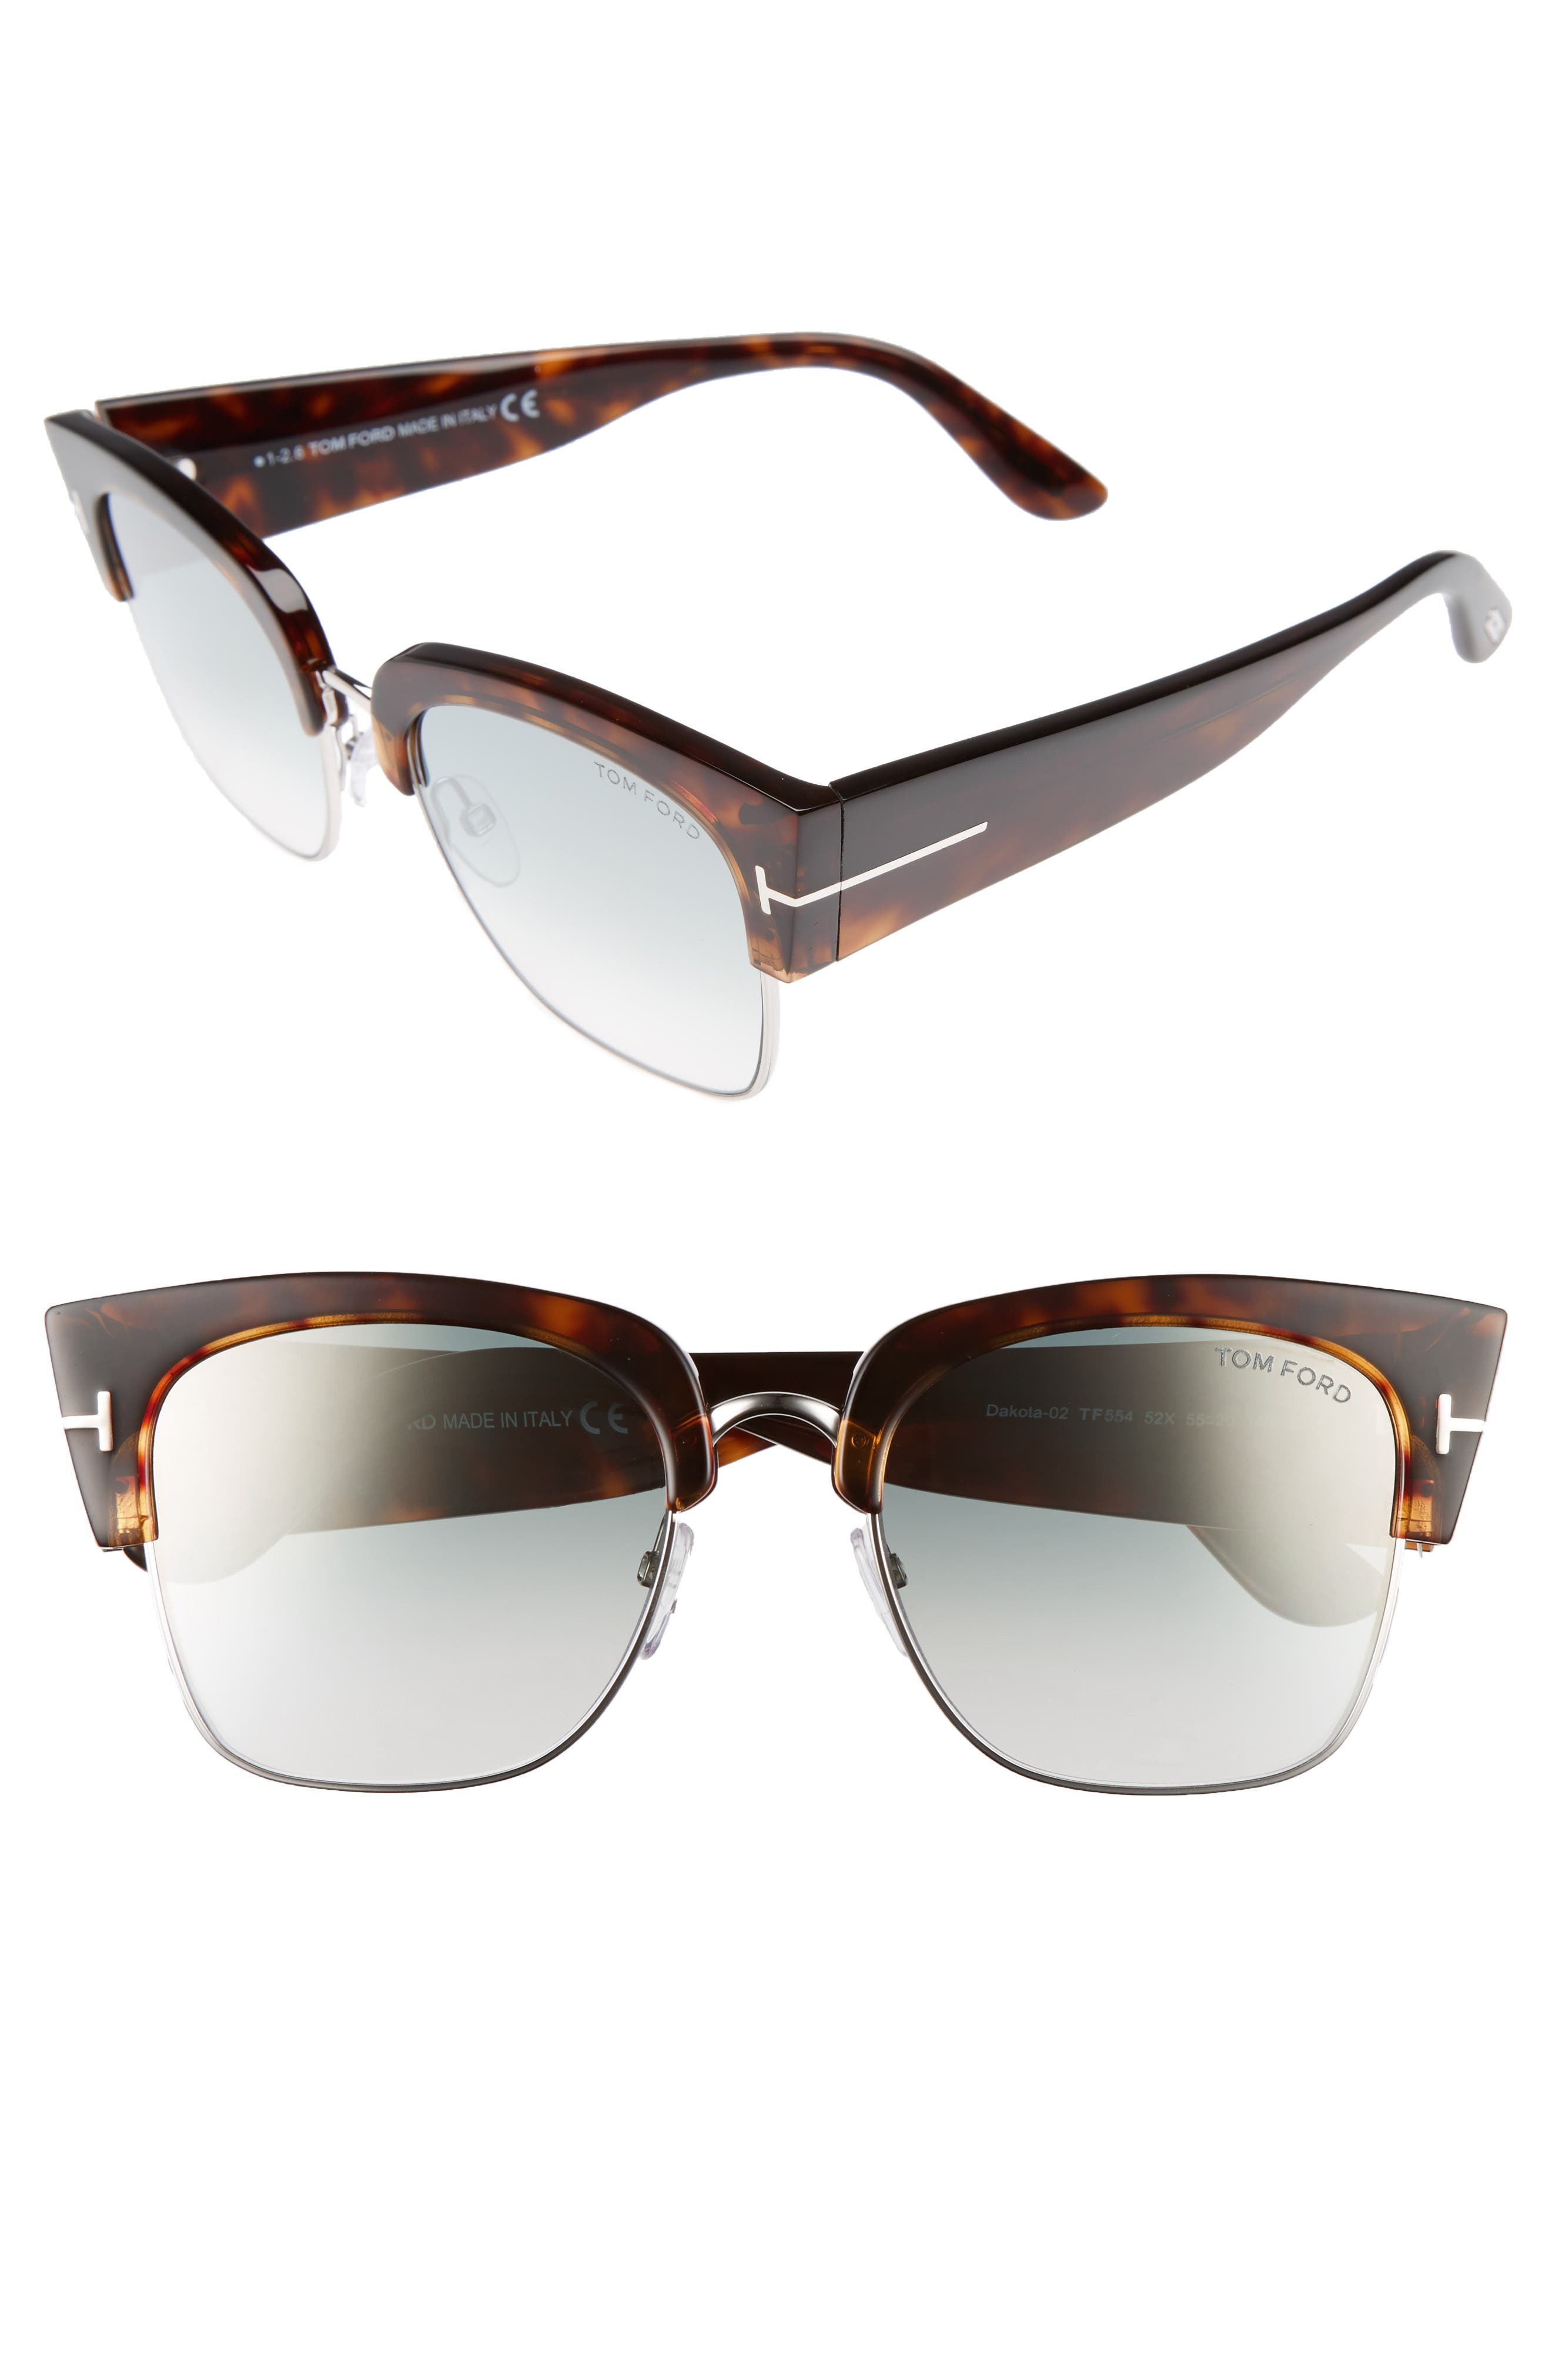 Dakota 55mm Gradient Square Sunglasses,                             Main thumbnail 1, color,                             DARK HAVANA/ BLUE MIRROR